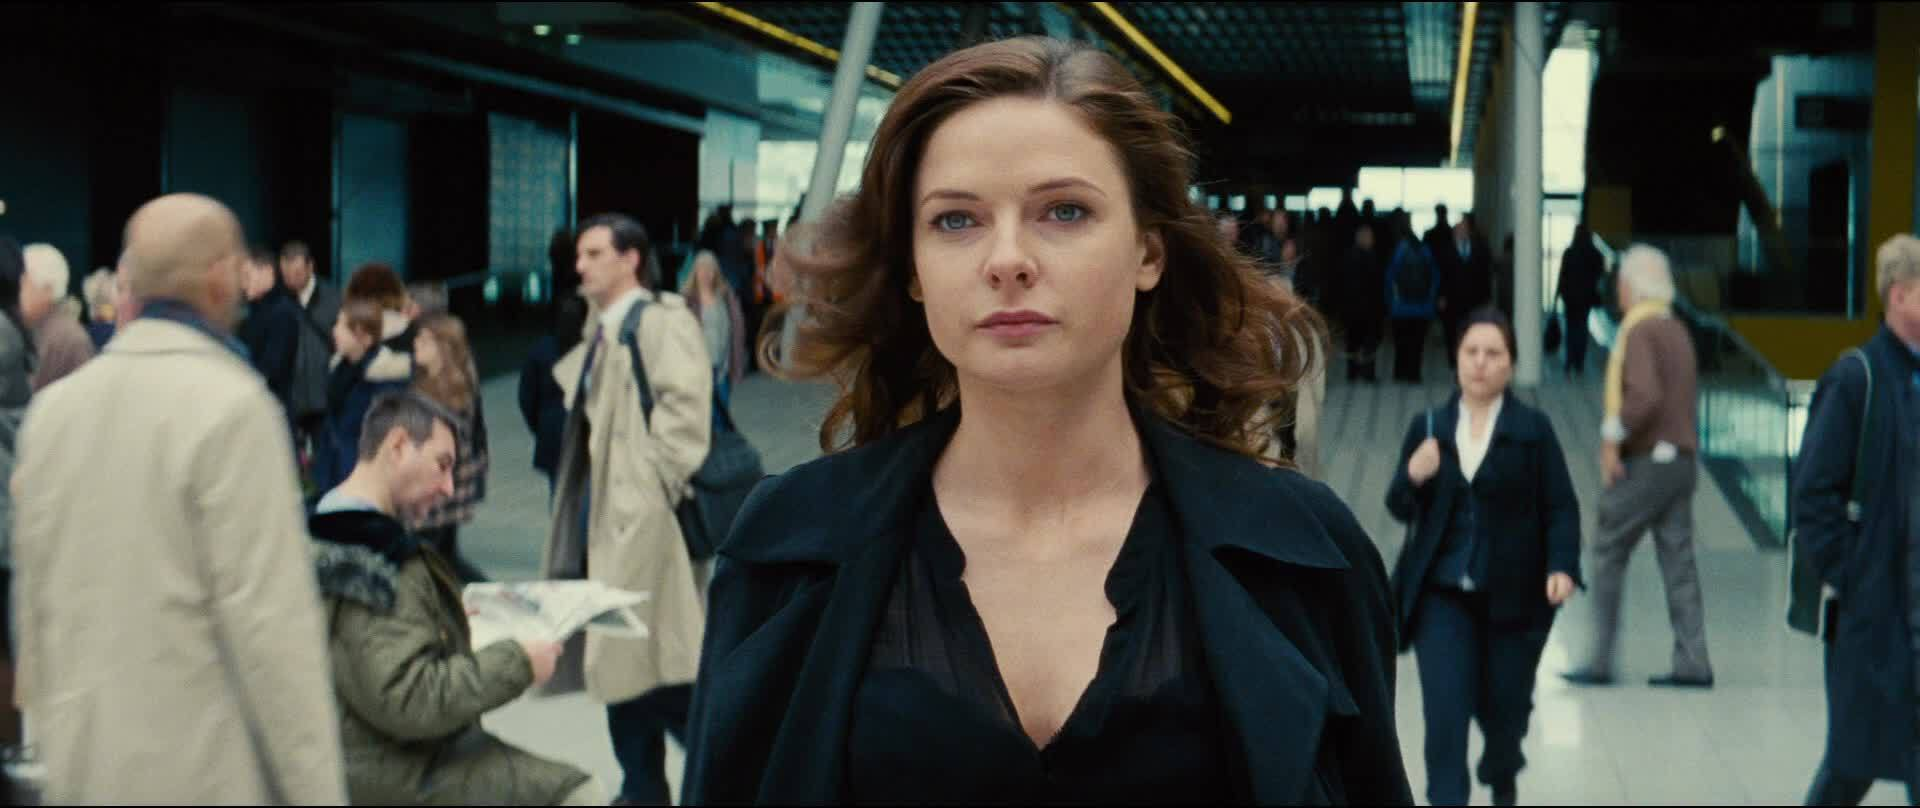 Mission Impossible, Rebecca Ferguson, RebeccaLouisaFerguson, Walking GIFs